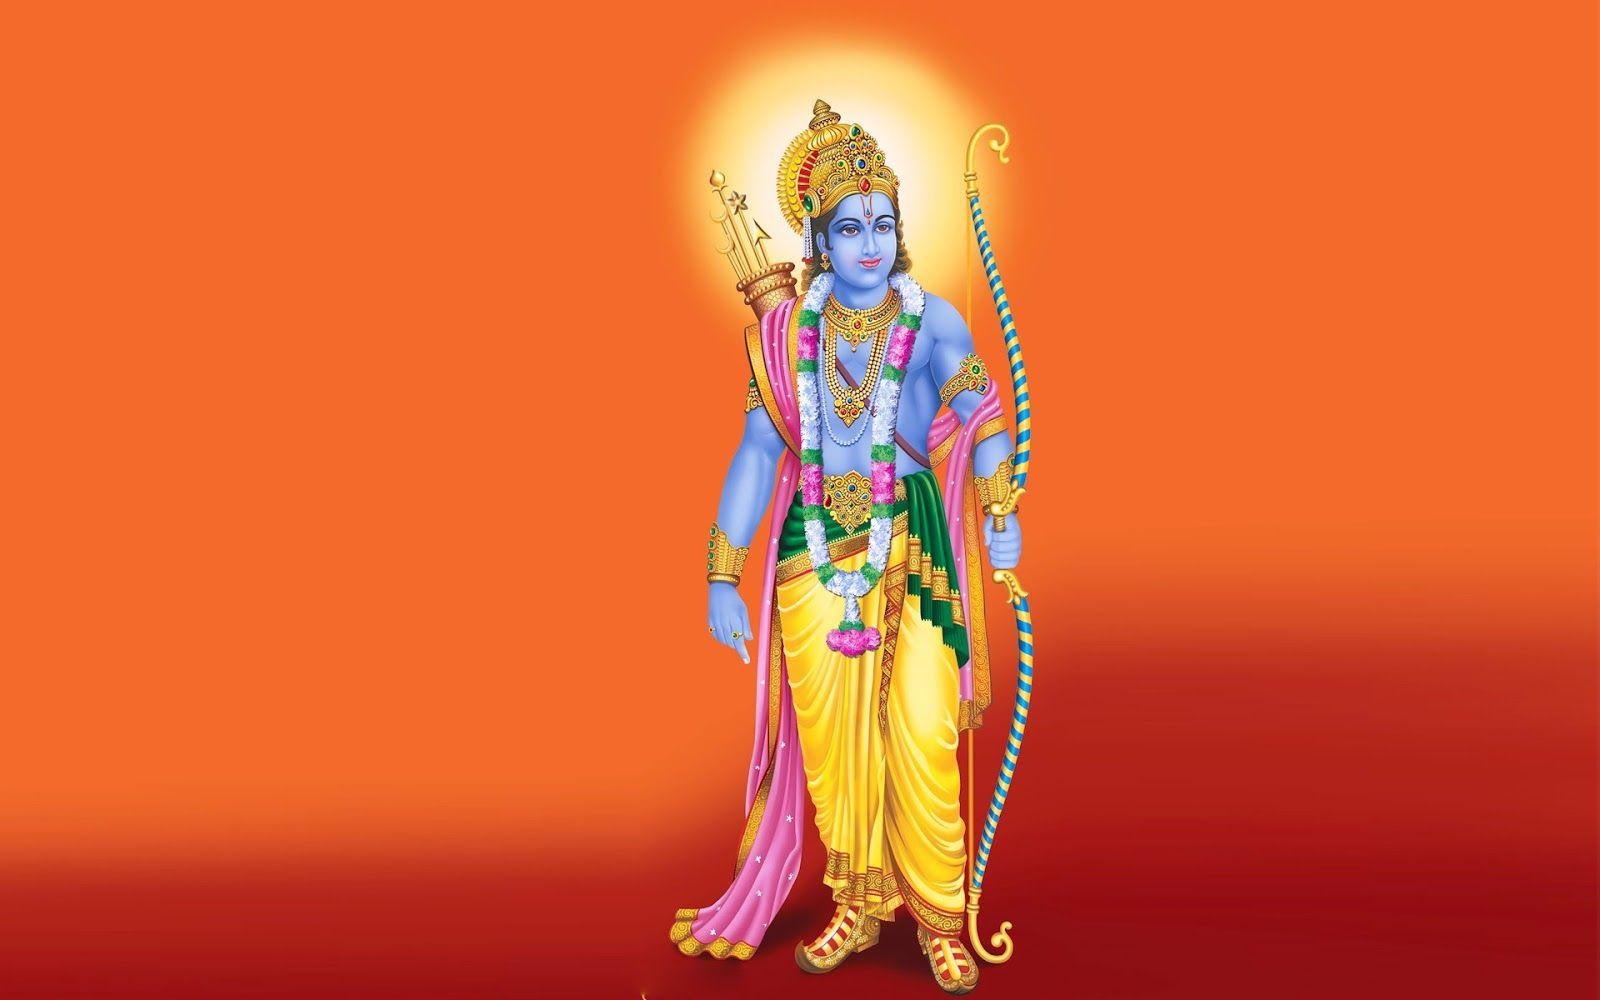 Top 10 Lord Shri Ram Hd Wallpapers Latest Free Hd